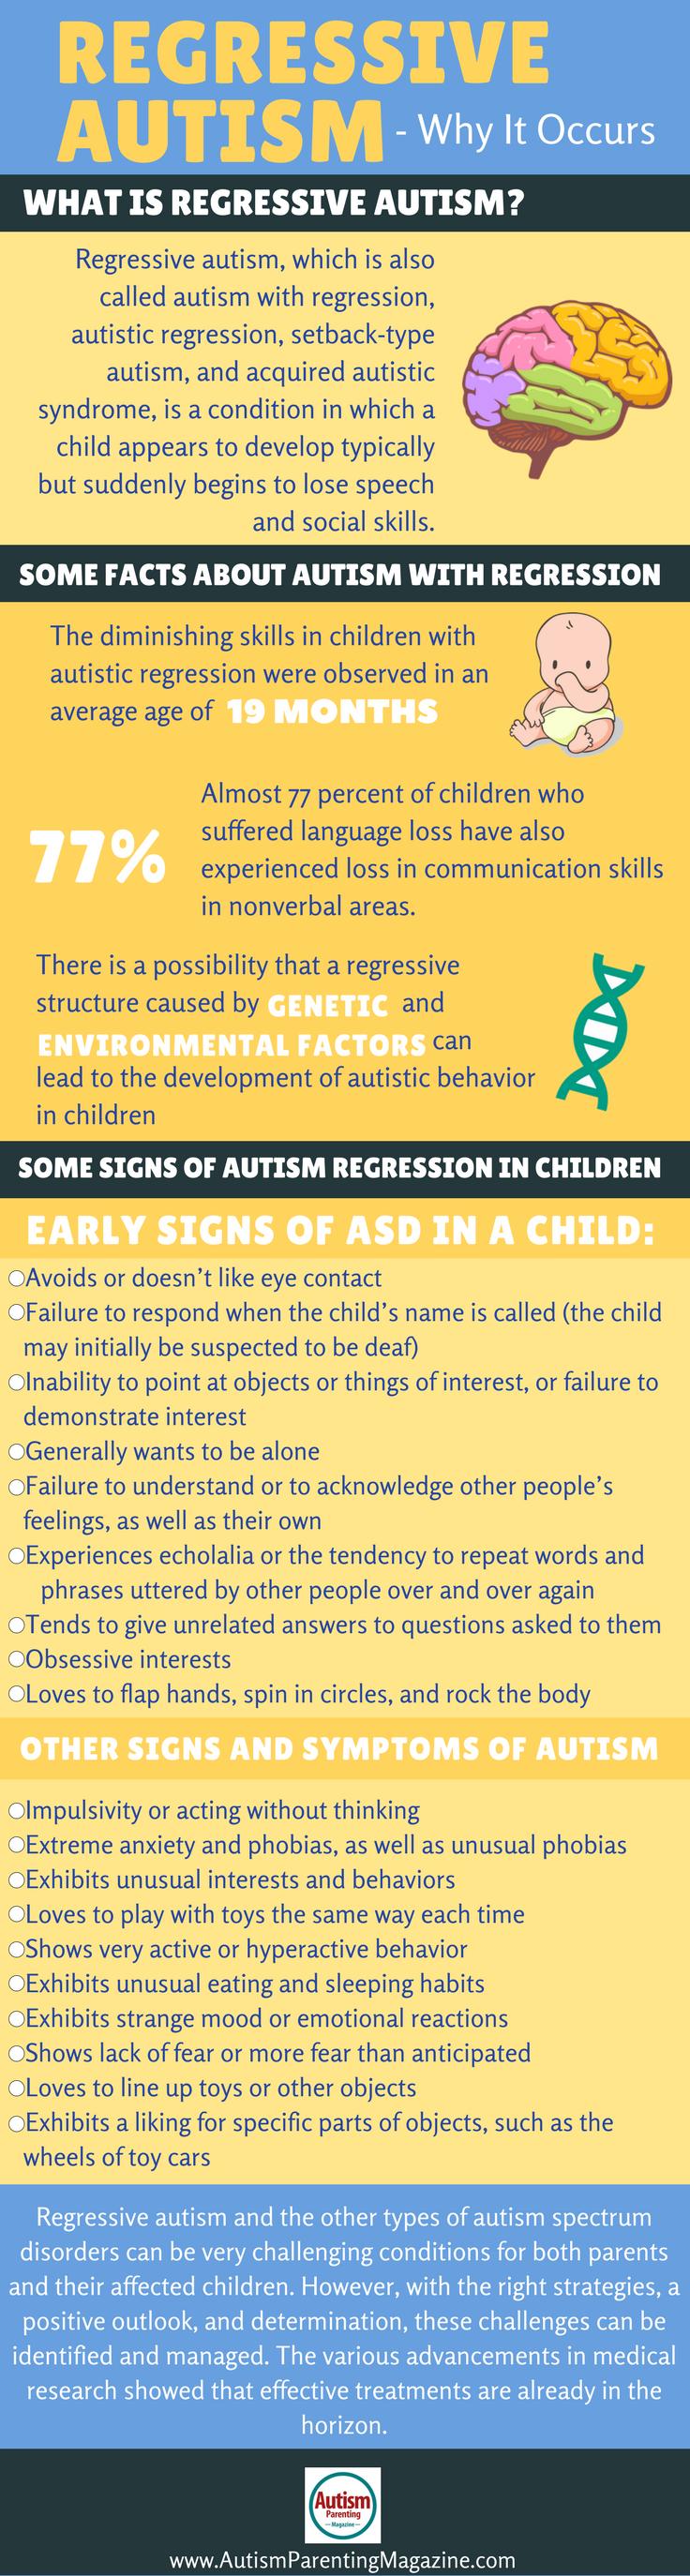 Regressive Autism – Why It Occurs